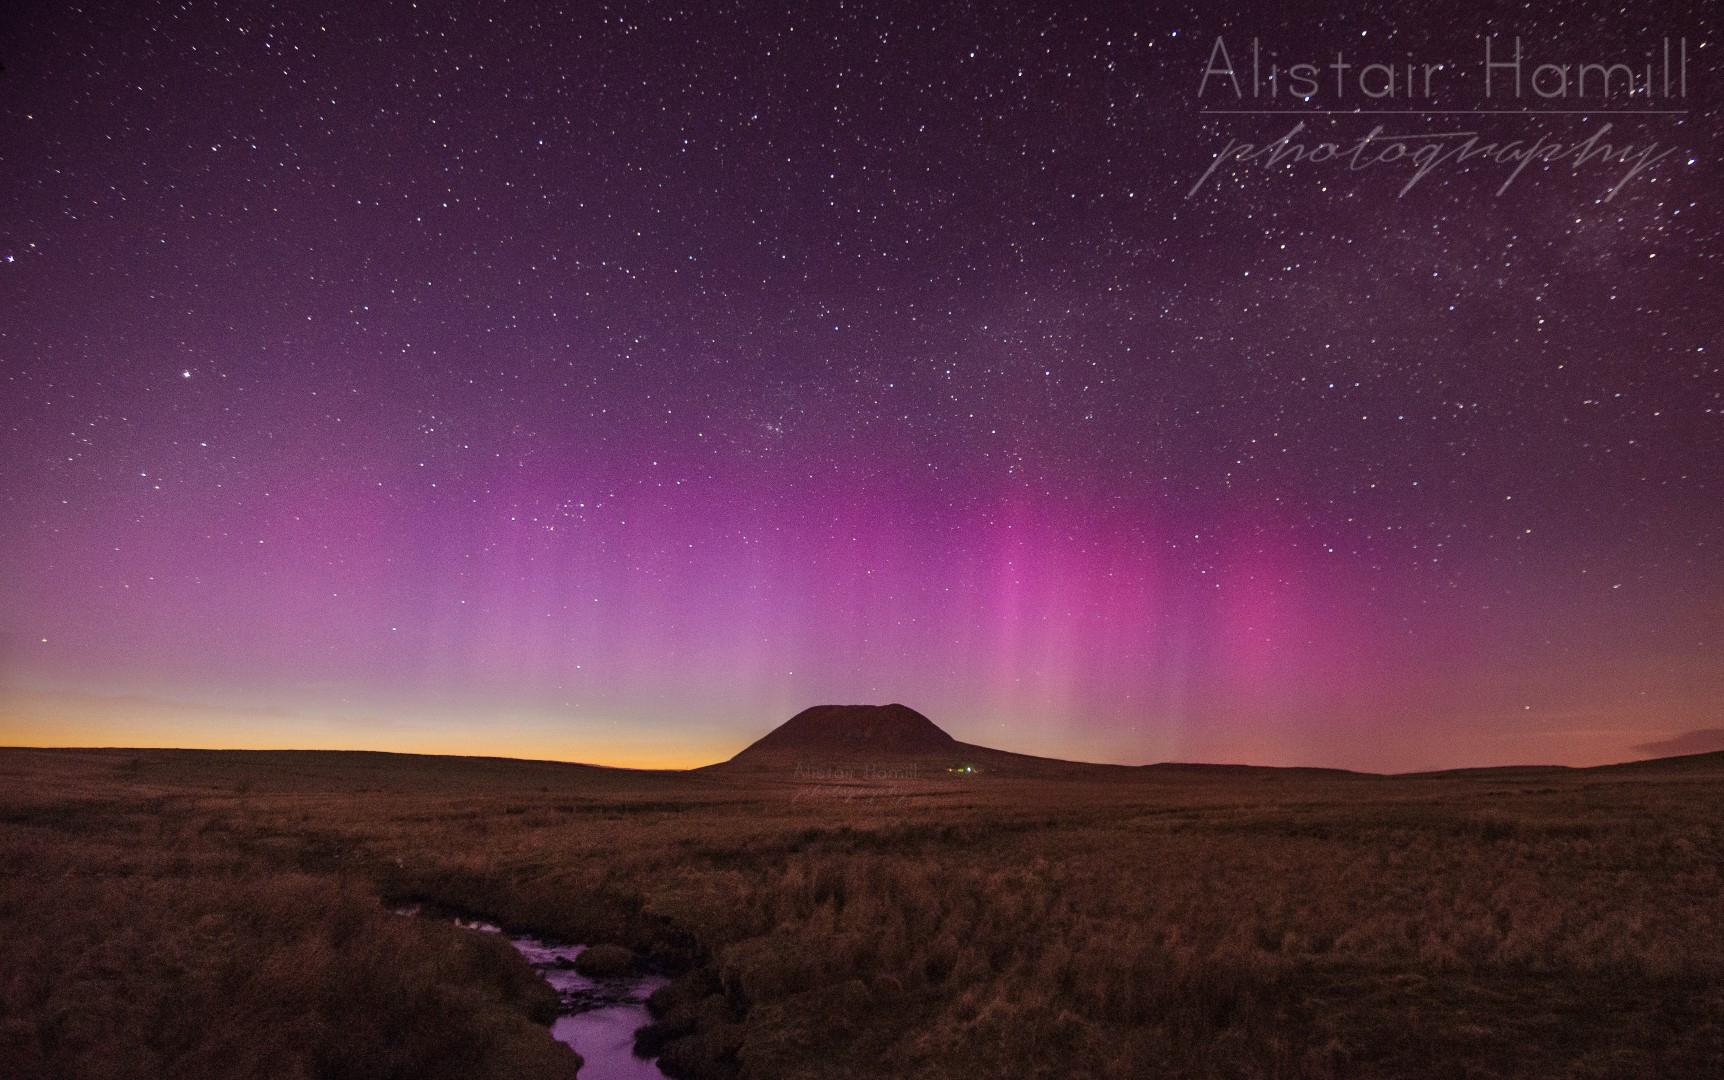 Slemish aurora, 12 May 2015